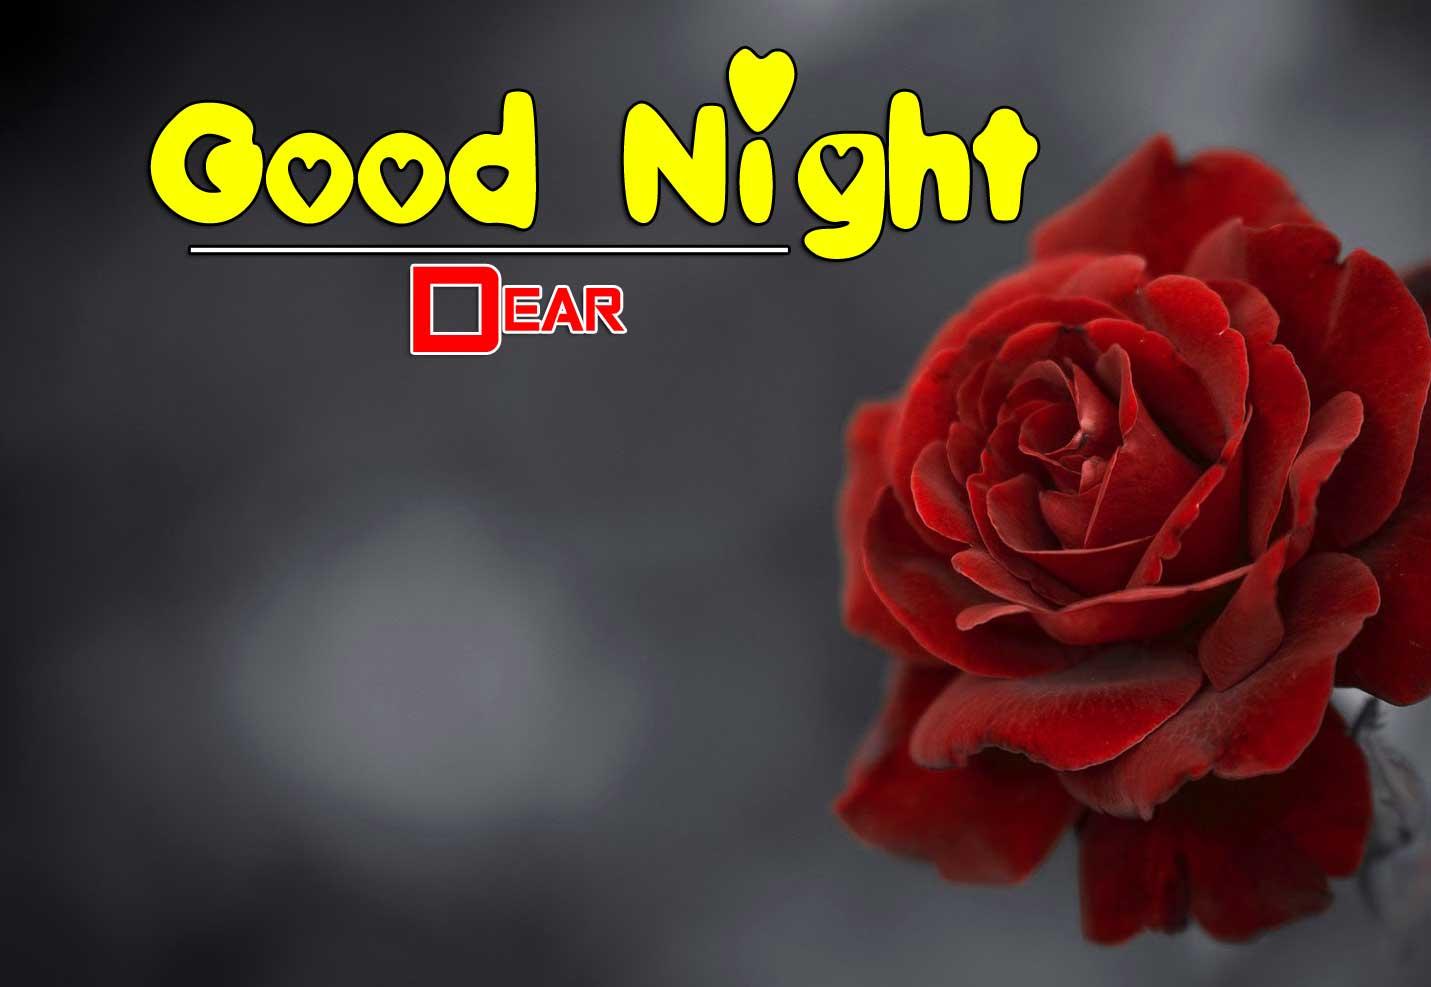 Free Full HD Good Night Wallpaper Free Download